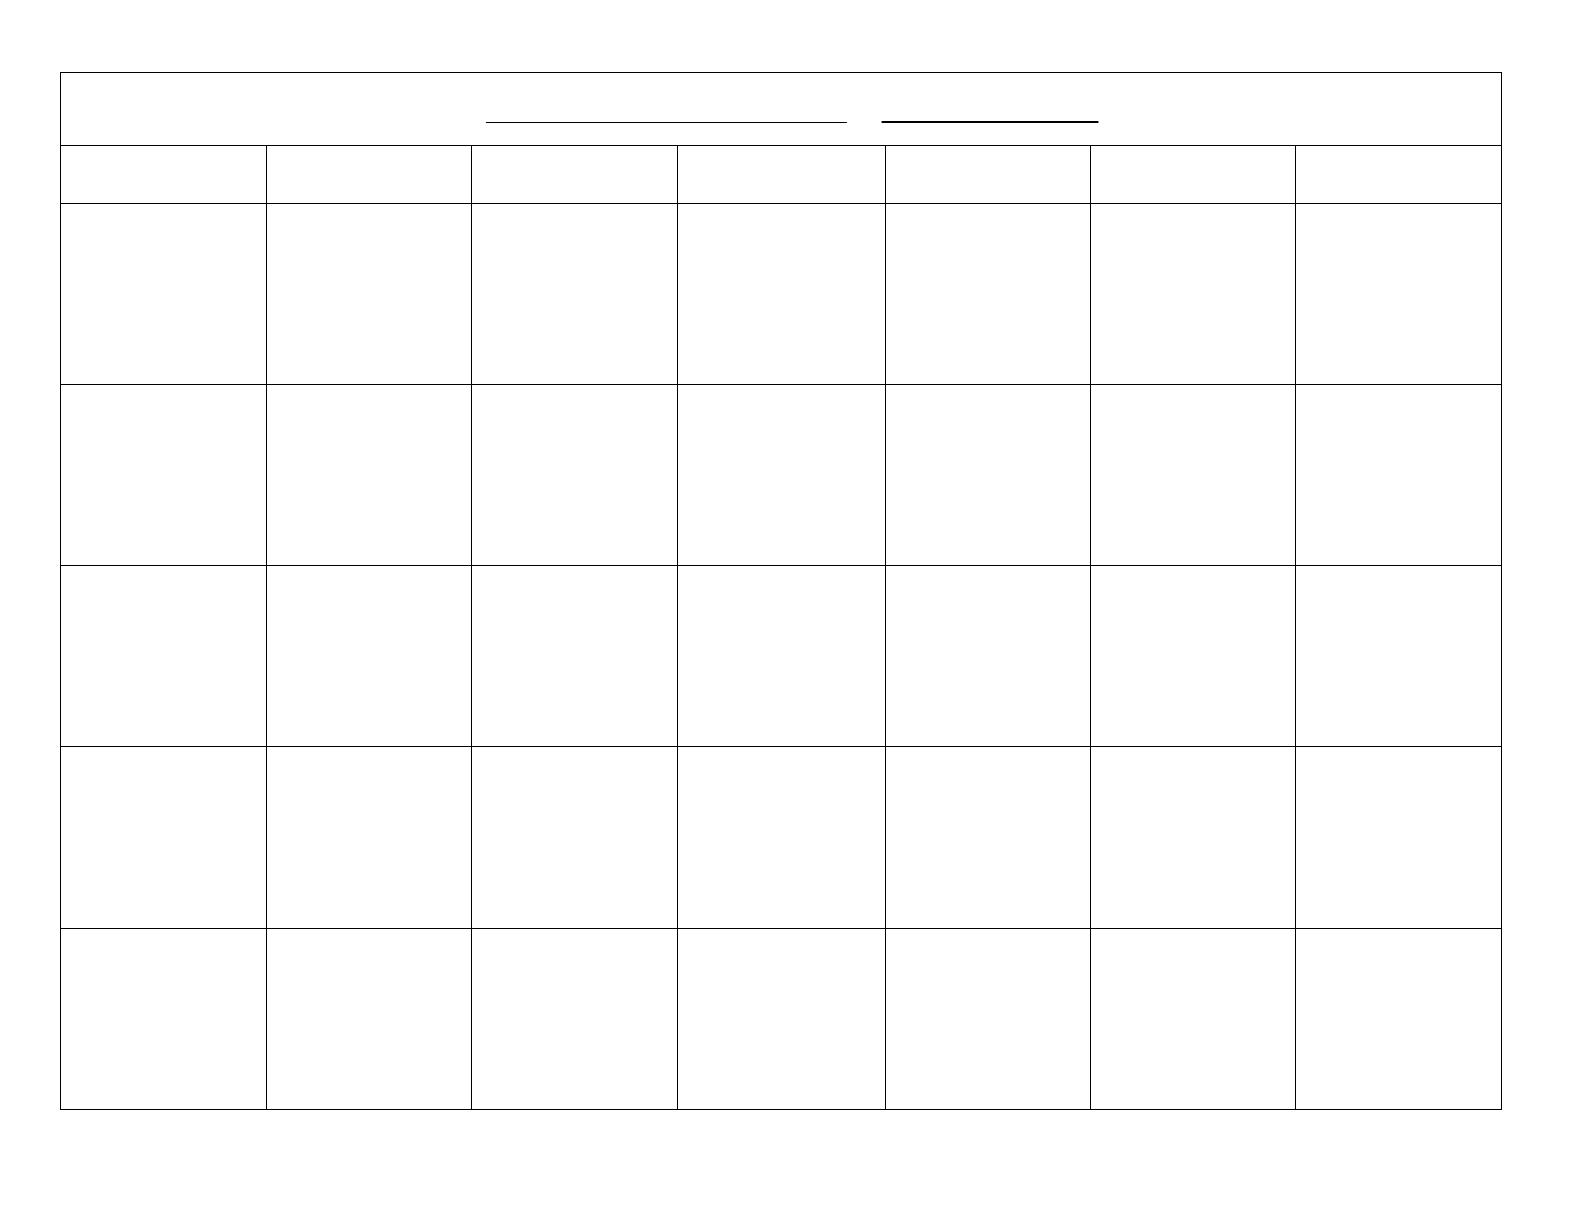 Handwriting Calendar - 30 Day - Monday - Edit, Fill, Sign  Blank 30-Day Calendar